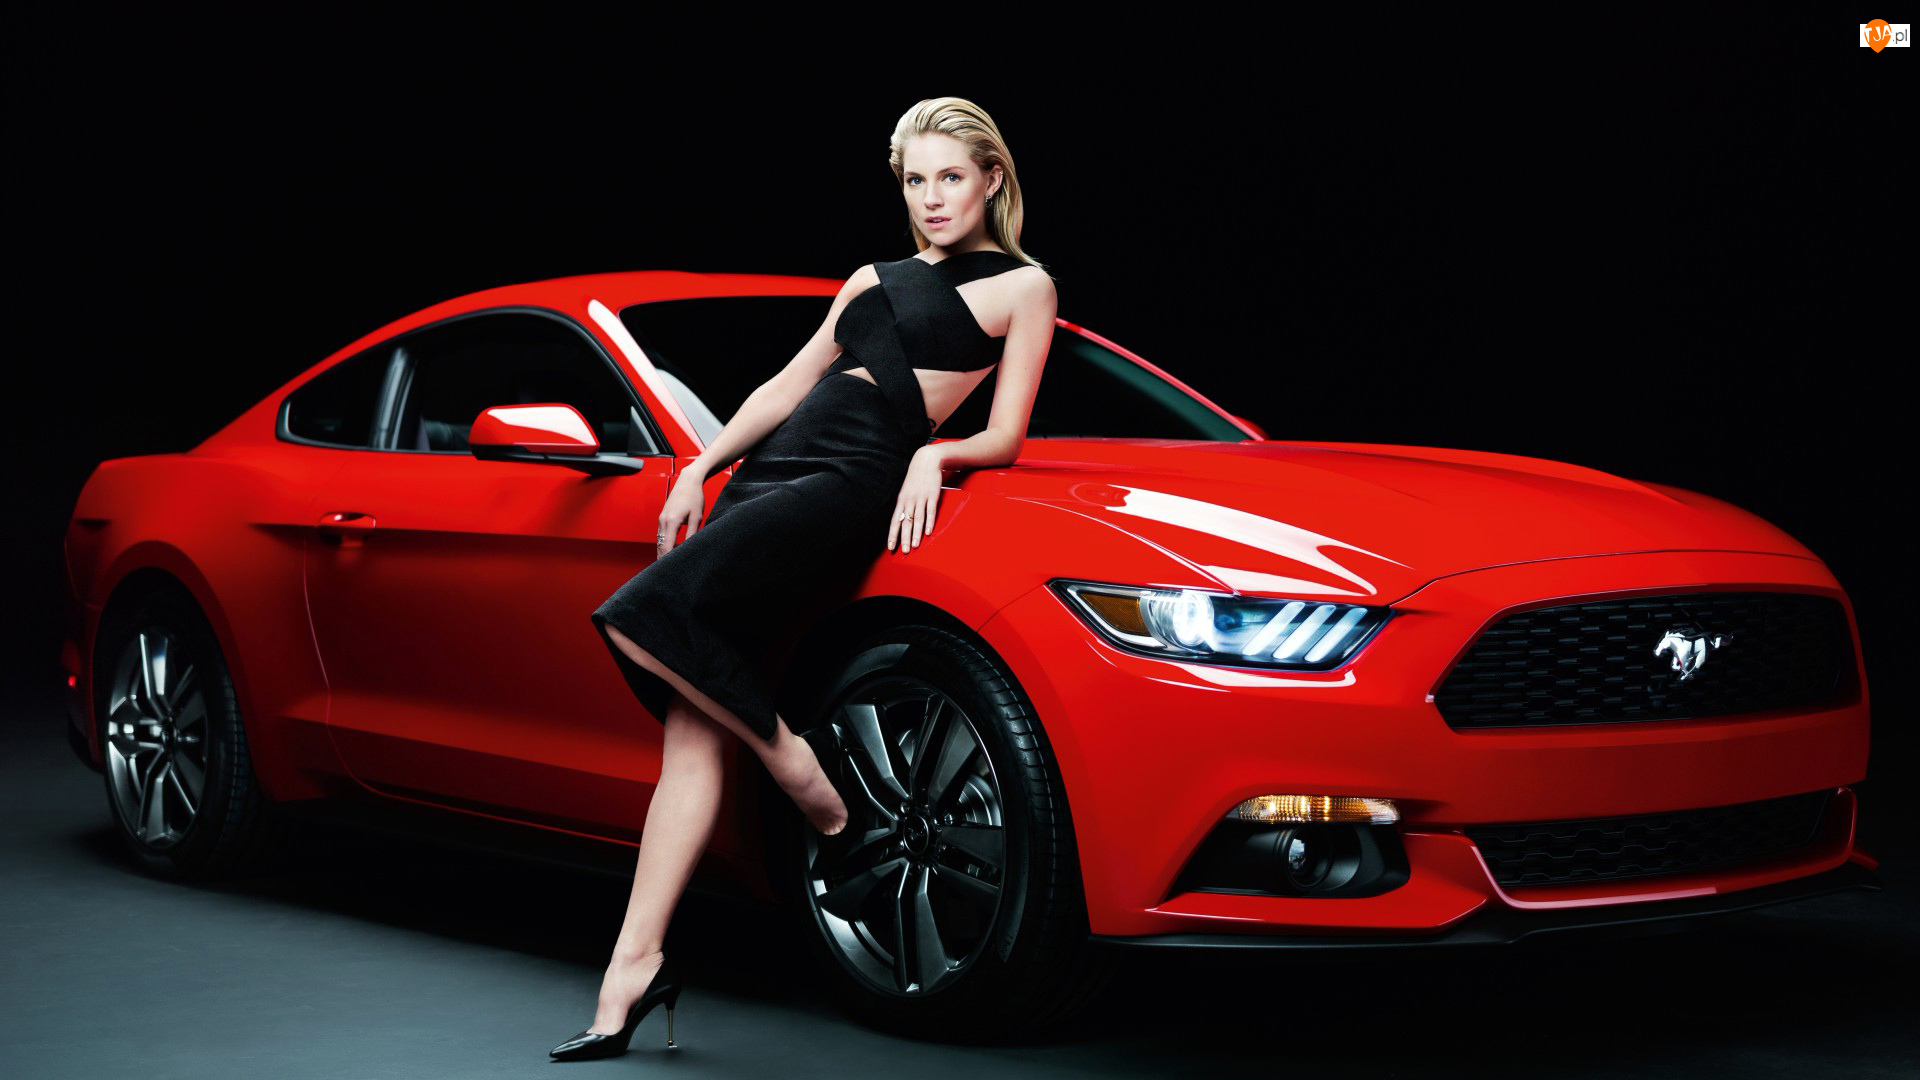 Czerwony, Ford Mustang, Aktorka, 2015, Sienna Miller, Samochód